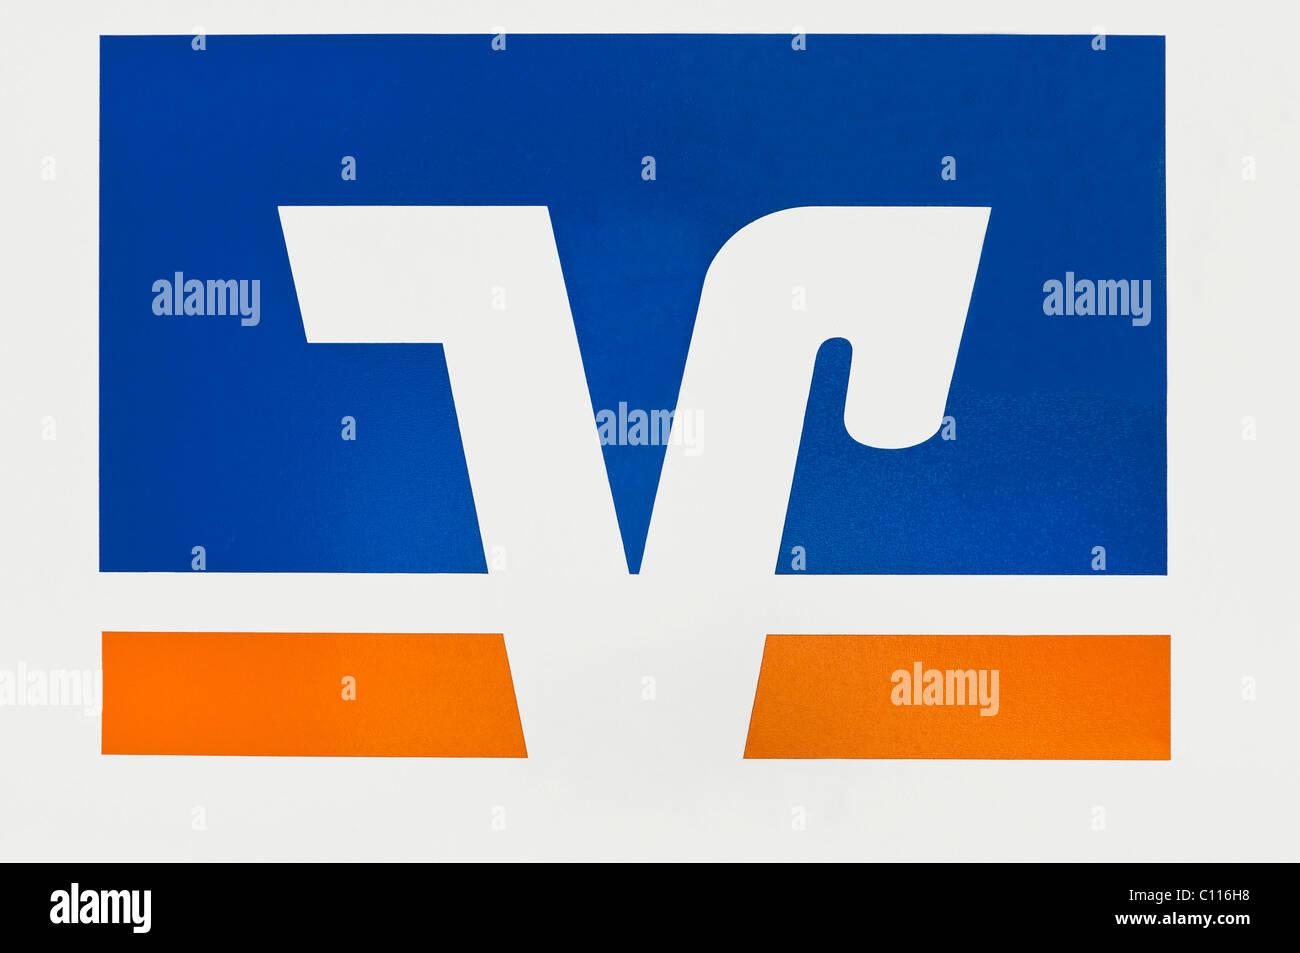 Logotipo de la Volksbanken Raiffeisenbanken, bancos cooperativos locales Imagen De Stock